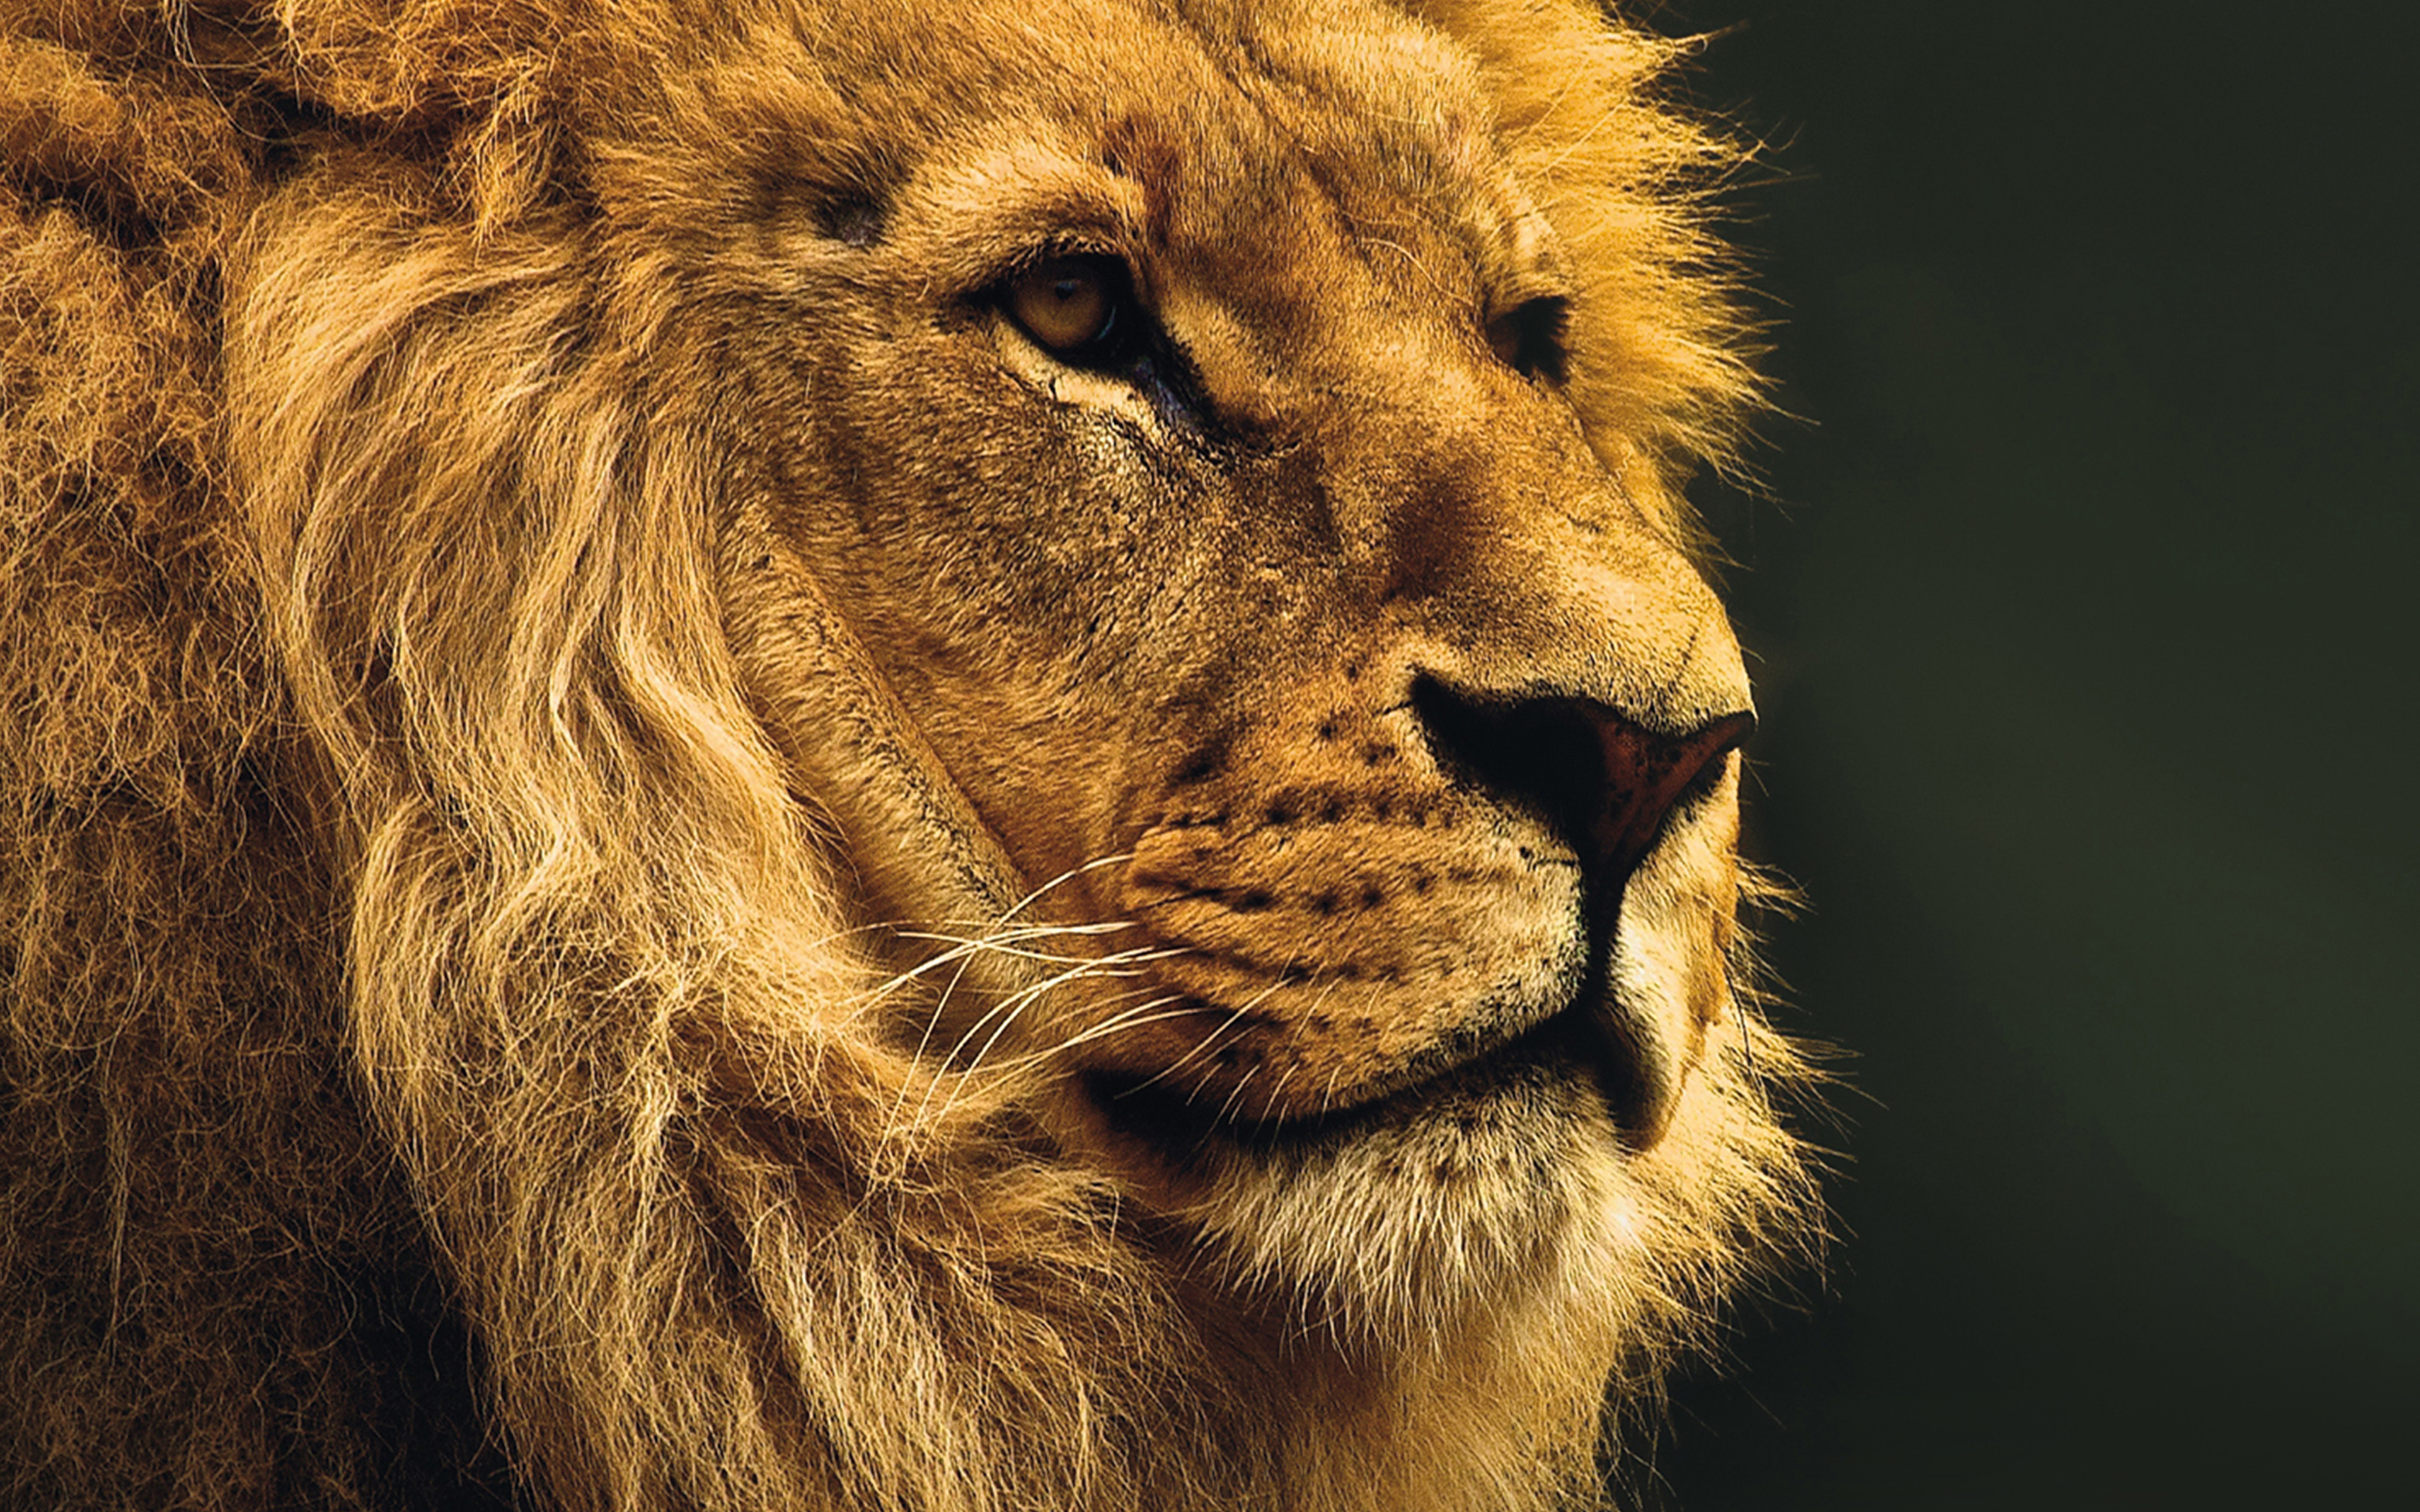 National Geographic Wallpaper Fall Mu49 National Geographic Nature Animal Lion Yellow Wallpaper